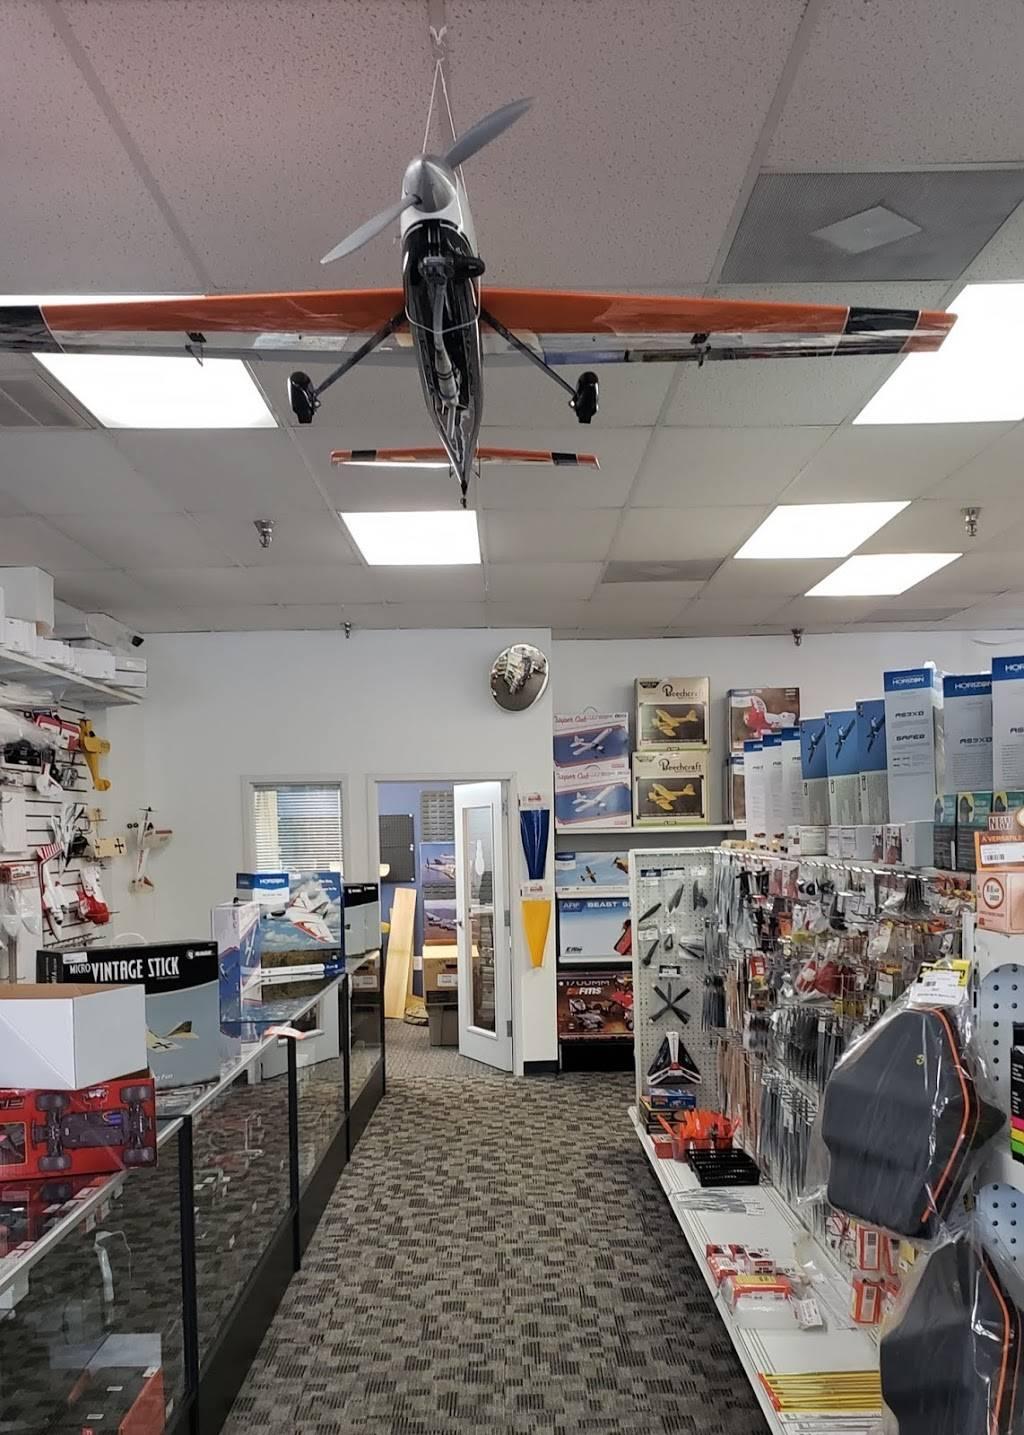 Central Carolina Hobbies - store  | Photo 2 of 10 | Address: 3722C Battleground Ave, Greensboro, NC 27410, USA | Phone: (336) 434-0900